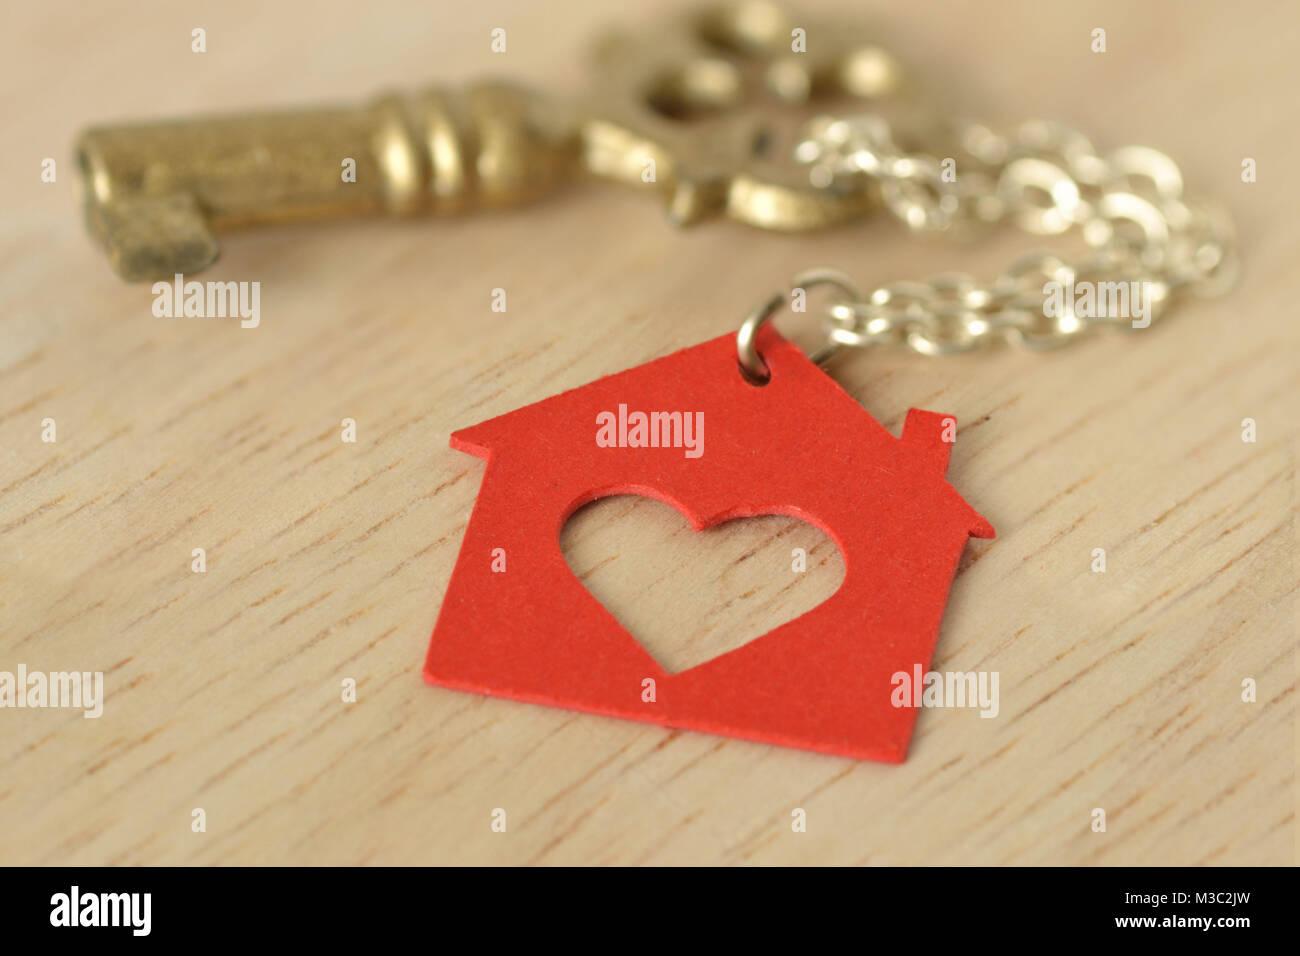 Paper Cut Key Heart Symbol Stock Photos Paper Cut Key Heart Symbol